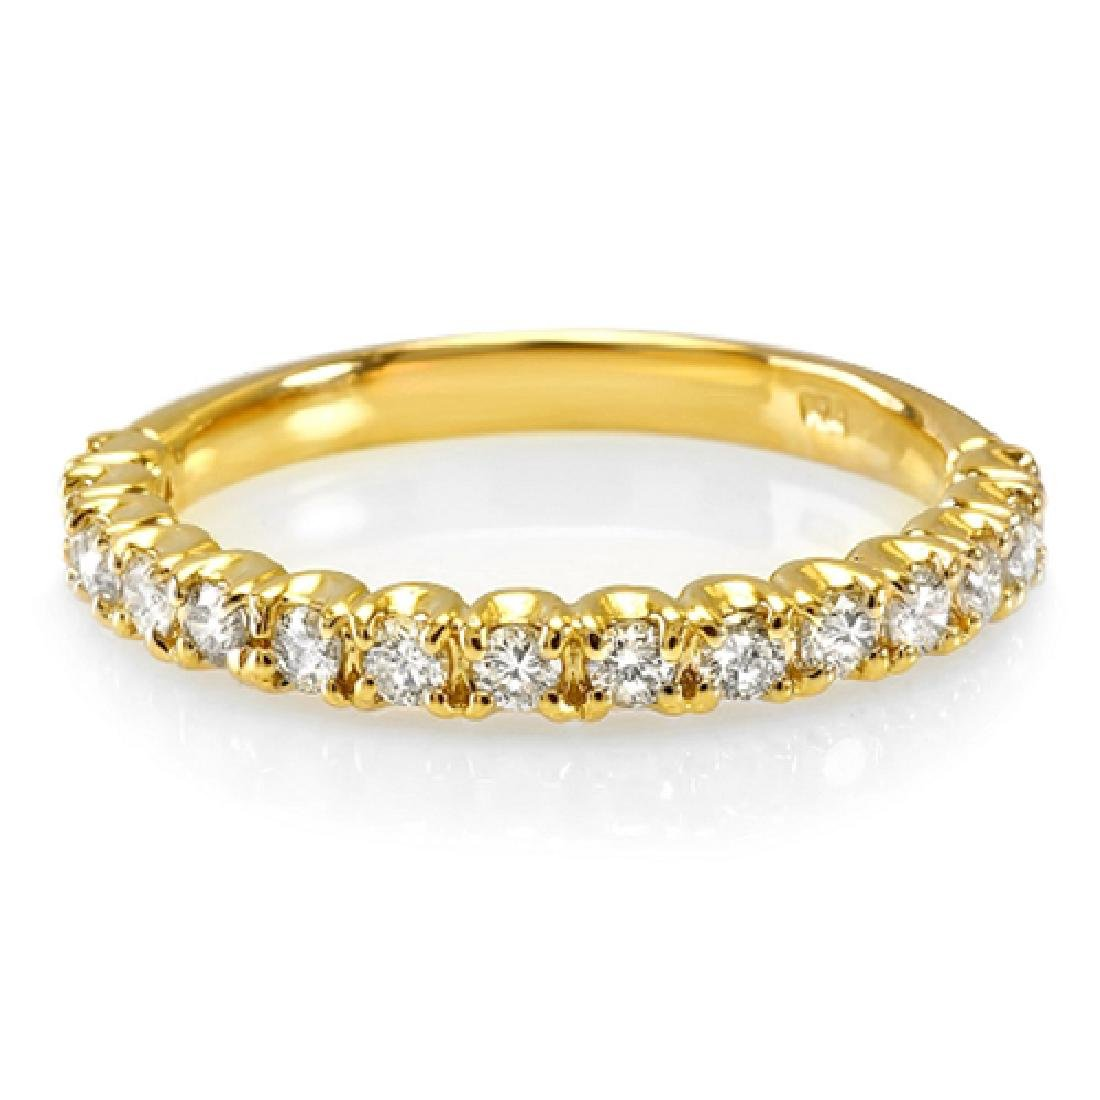 Mens 0.40 Carat Natural Diamond 18K Solid Yellow Gold